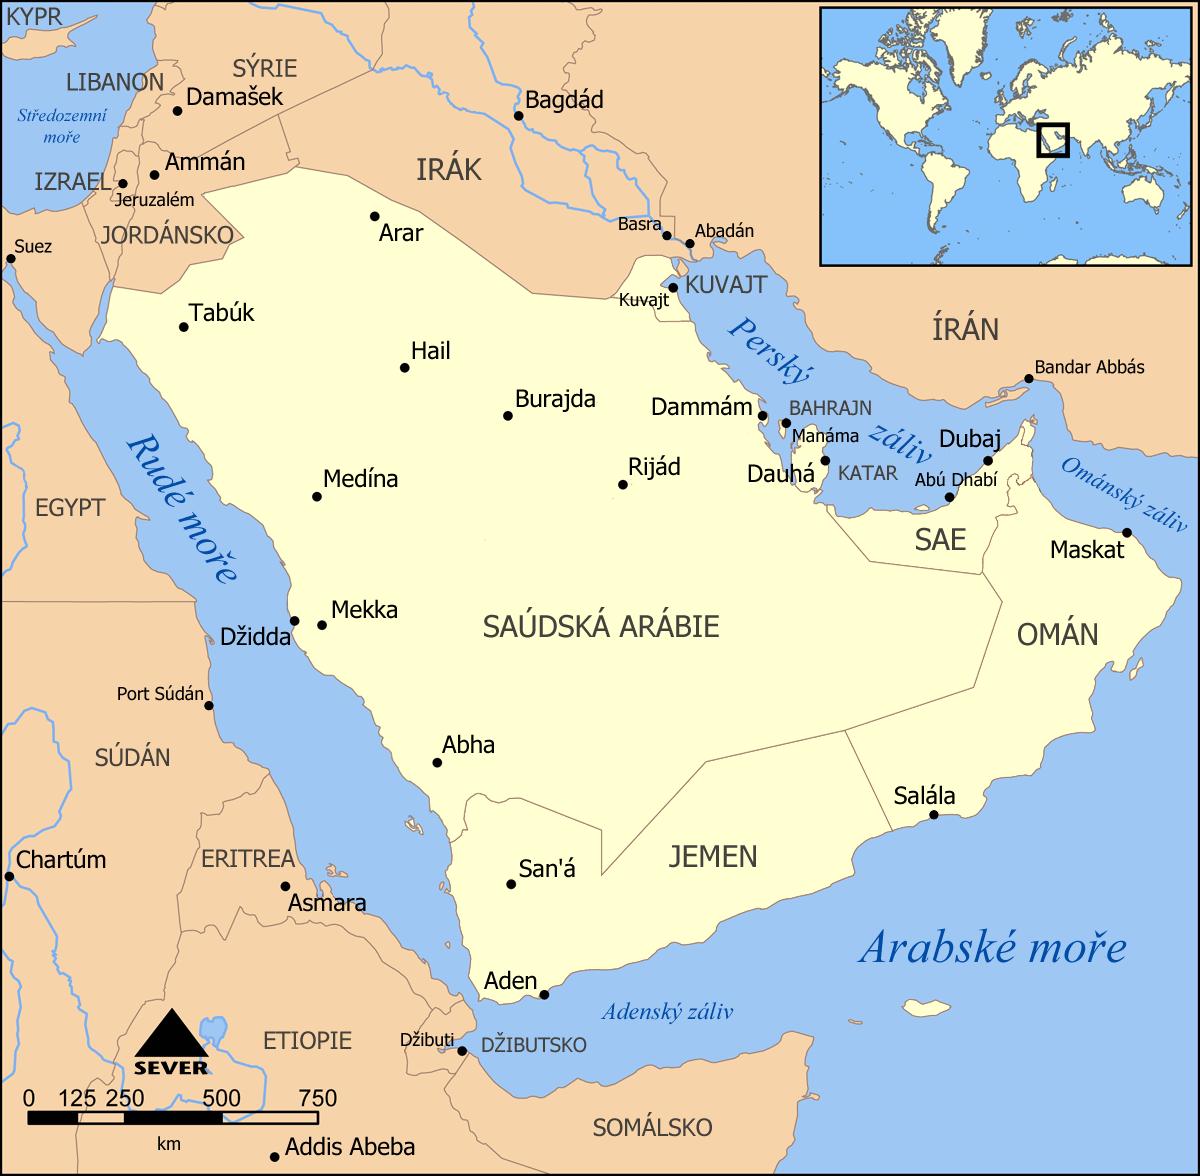 Dhofar Uma Terra Sobre O Mar Da Arabia Por Joao Machado